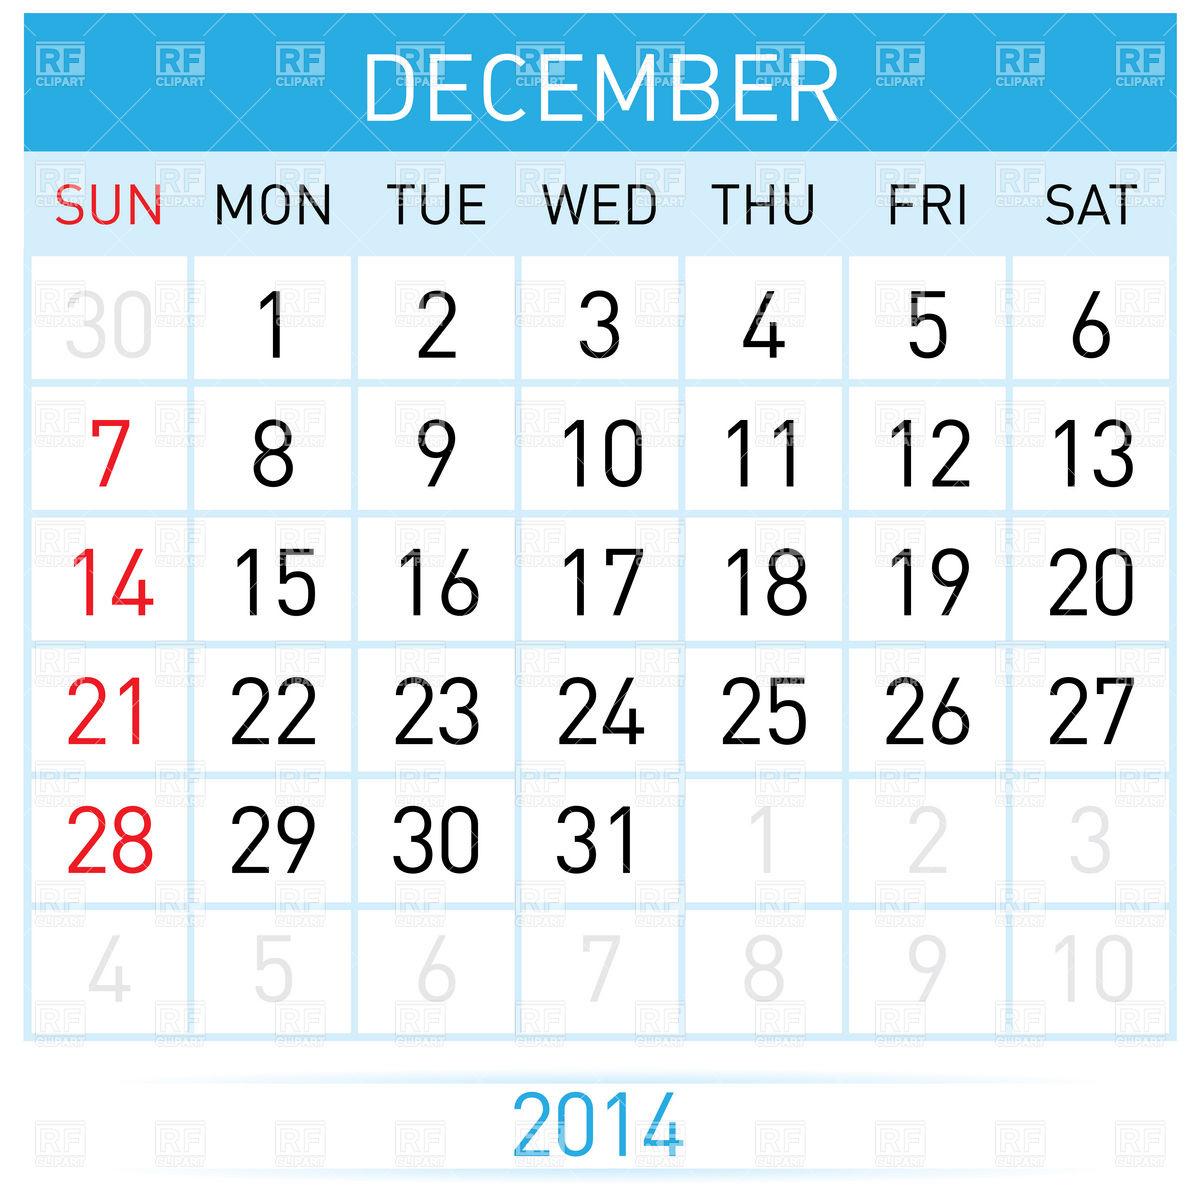 December 2014 month calendar Stock Vector Image.